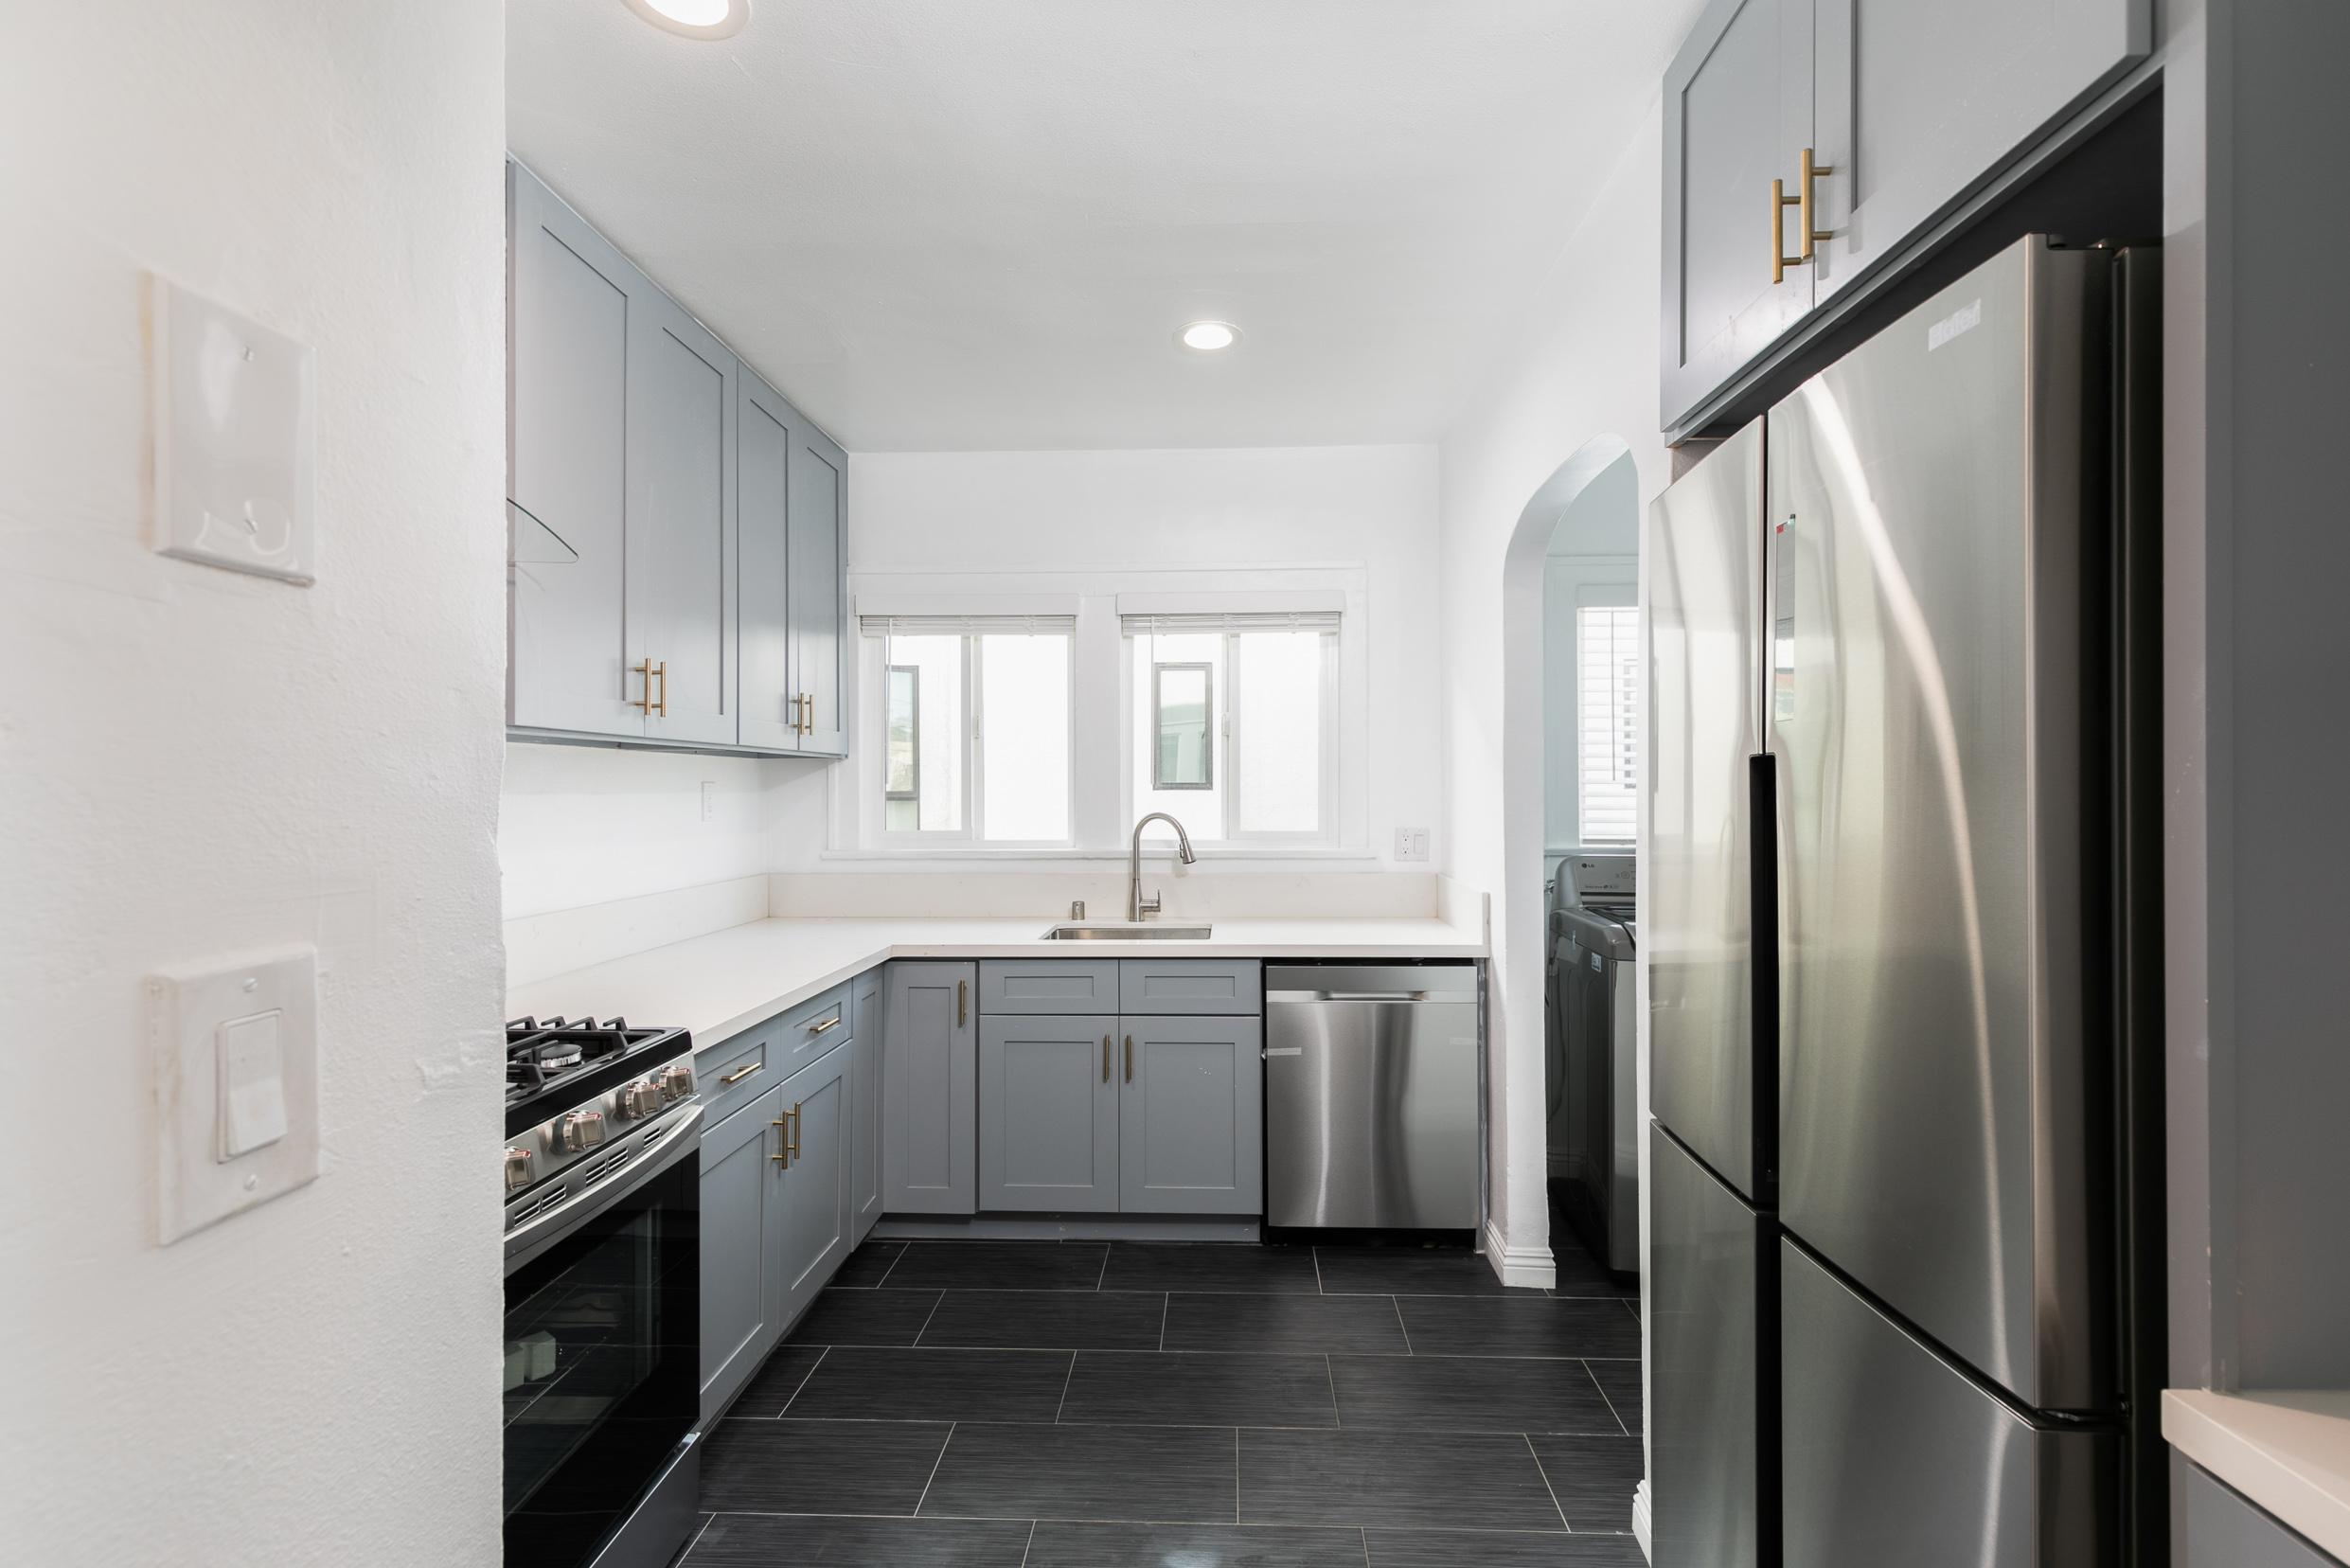 Cute 2BR/2BA Duplex Unit w/ Decorative Fireplace! ASK ABOUT MOVE-IN CONCESSION